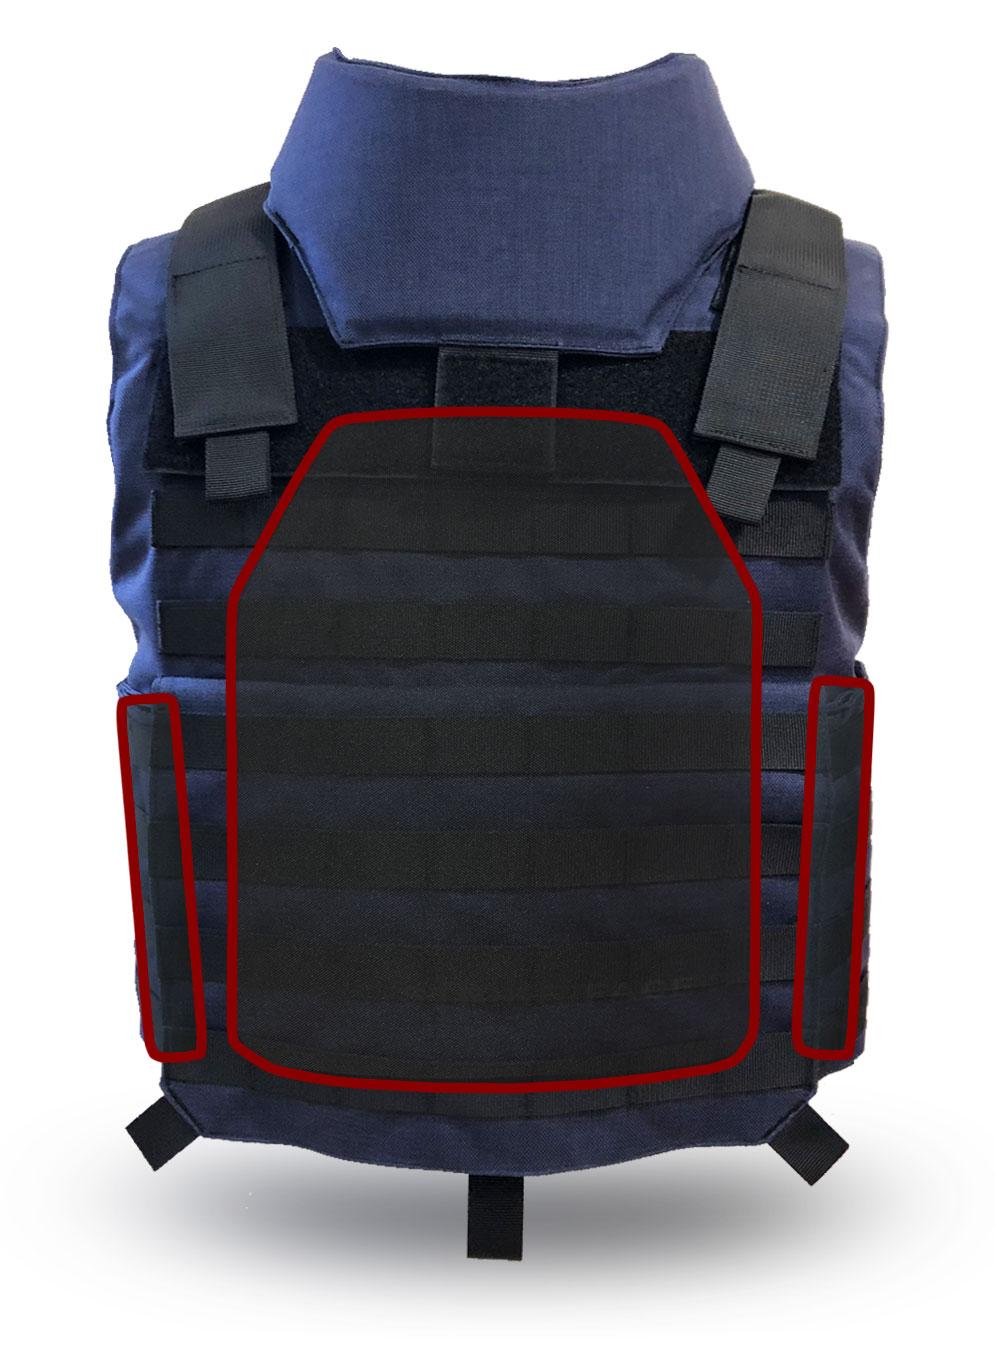 vest body armor lrg 1571 battle